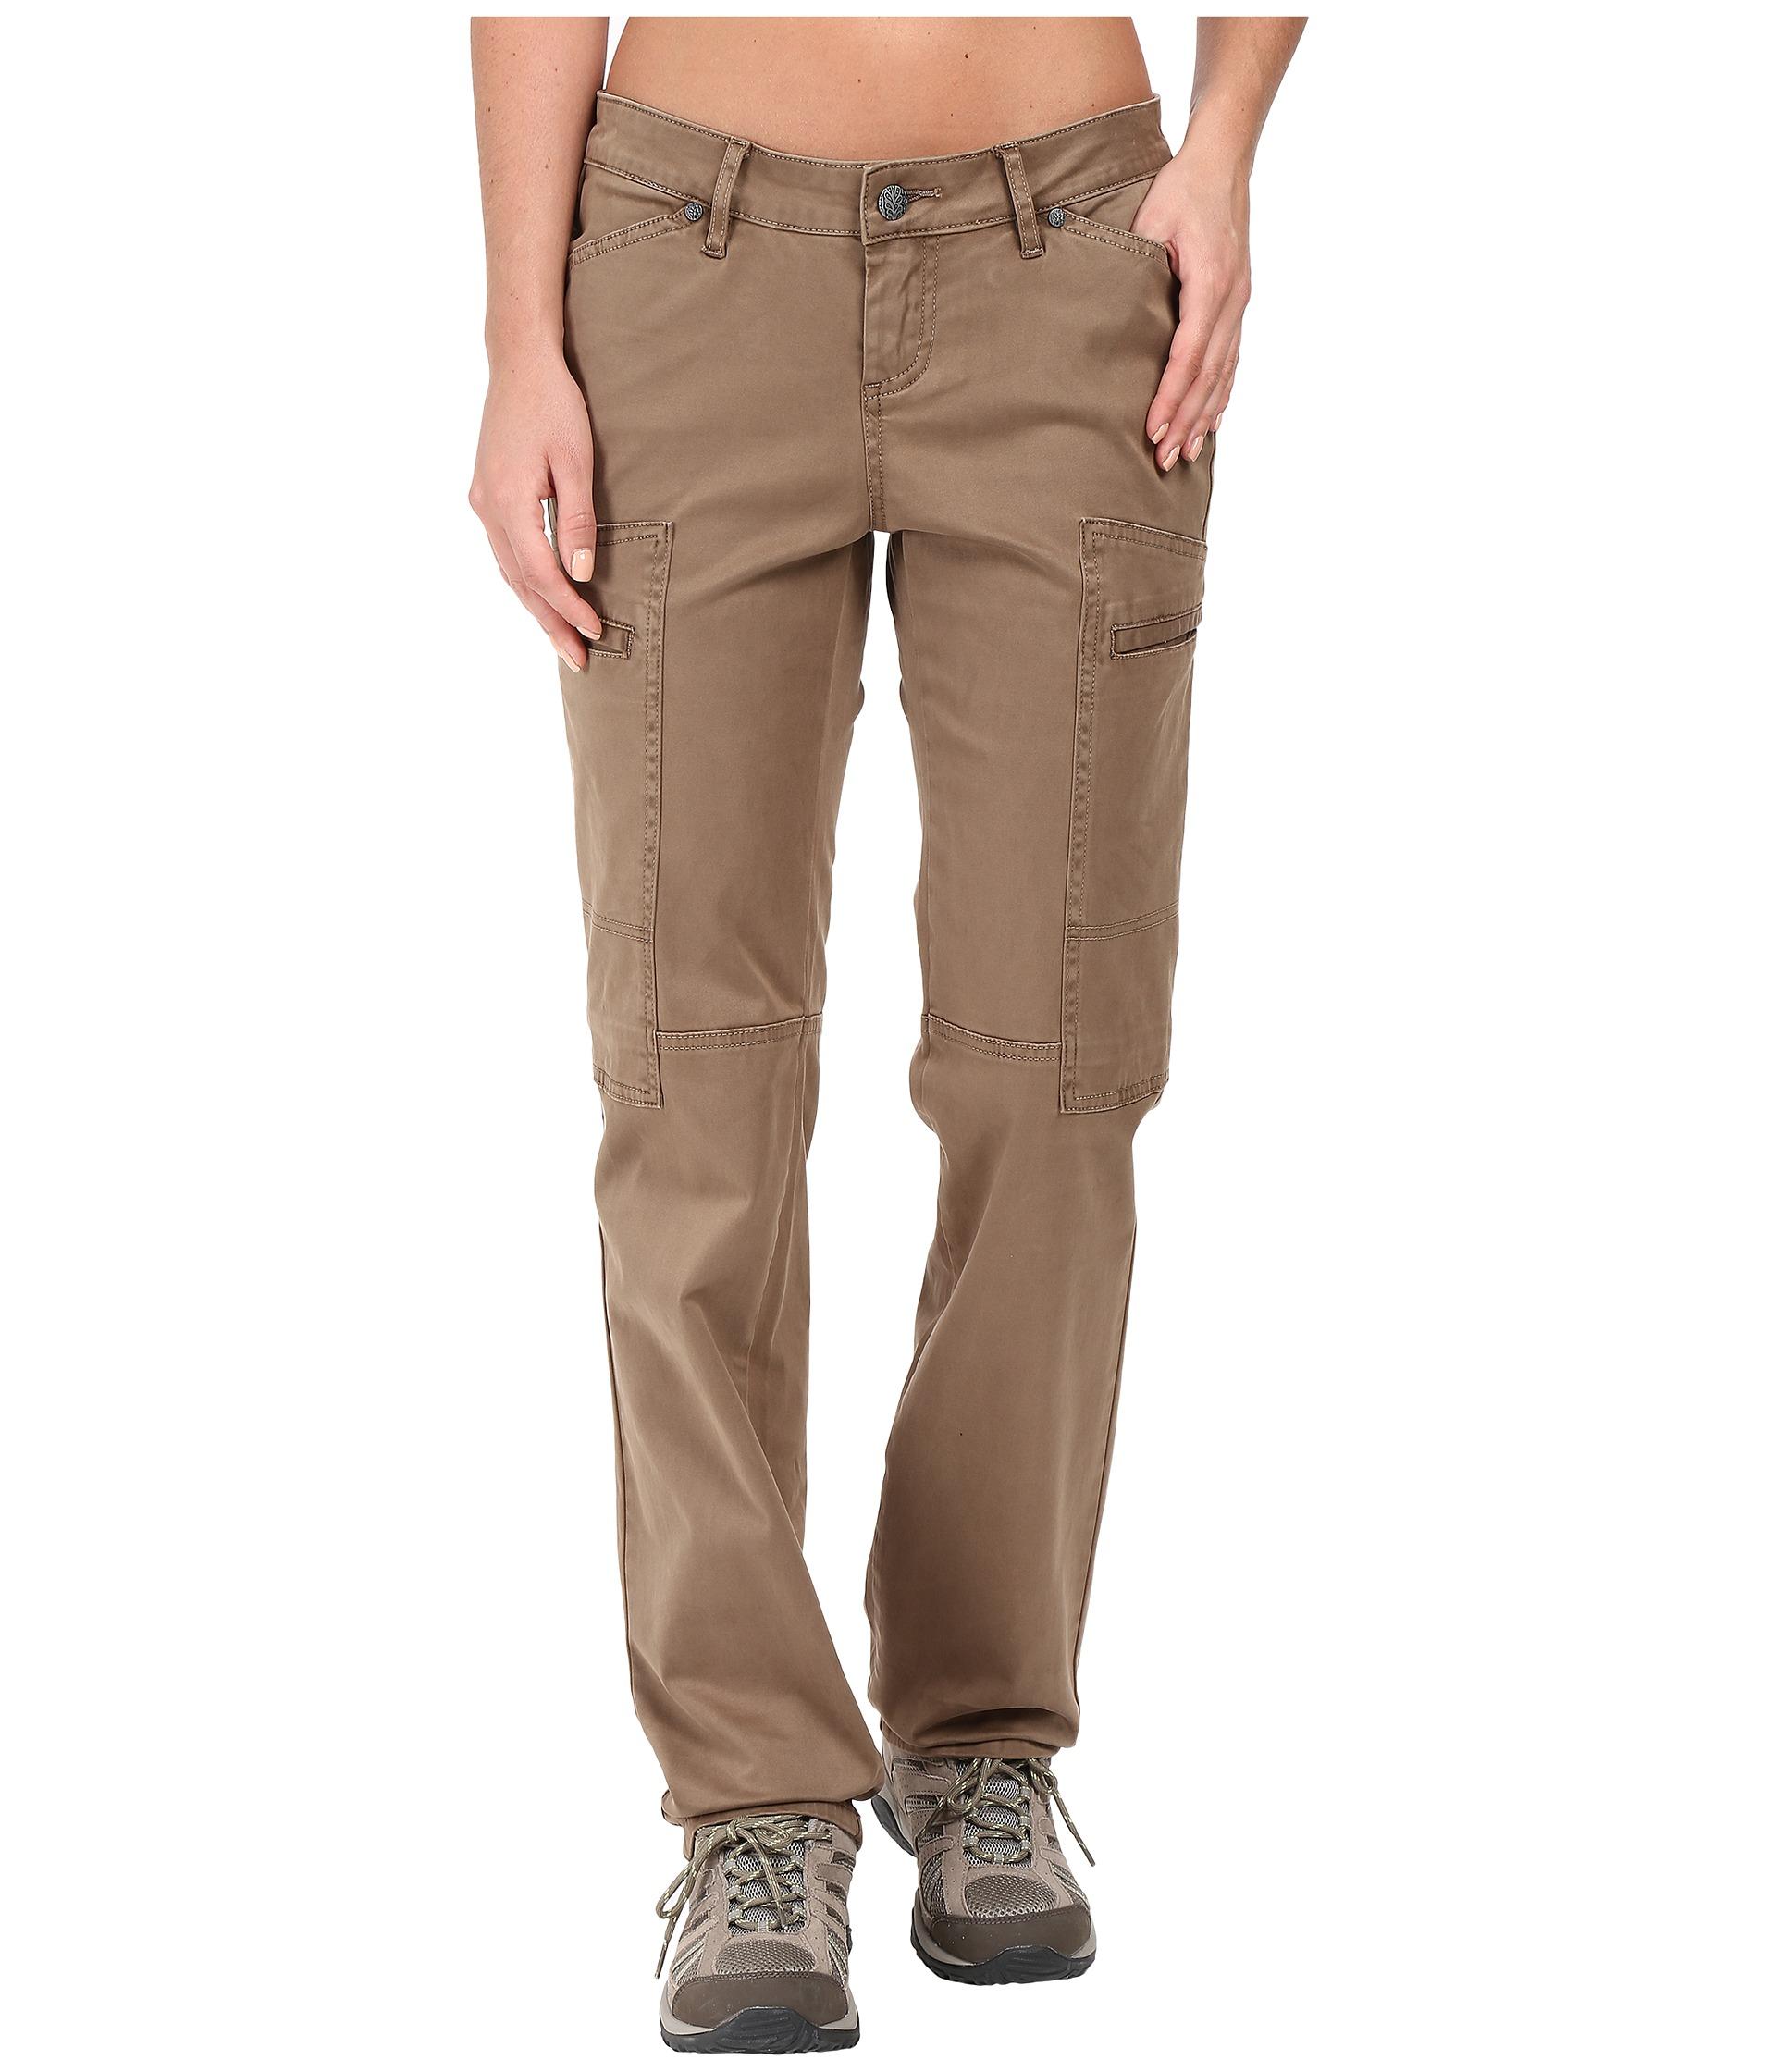 Pants, Women, Cargo Pants   Shipped Free at Zappos